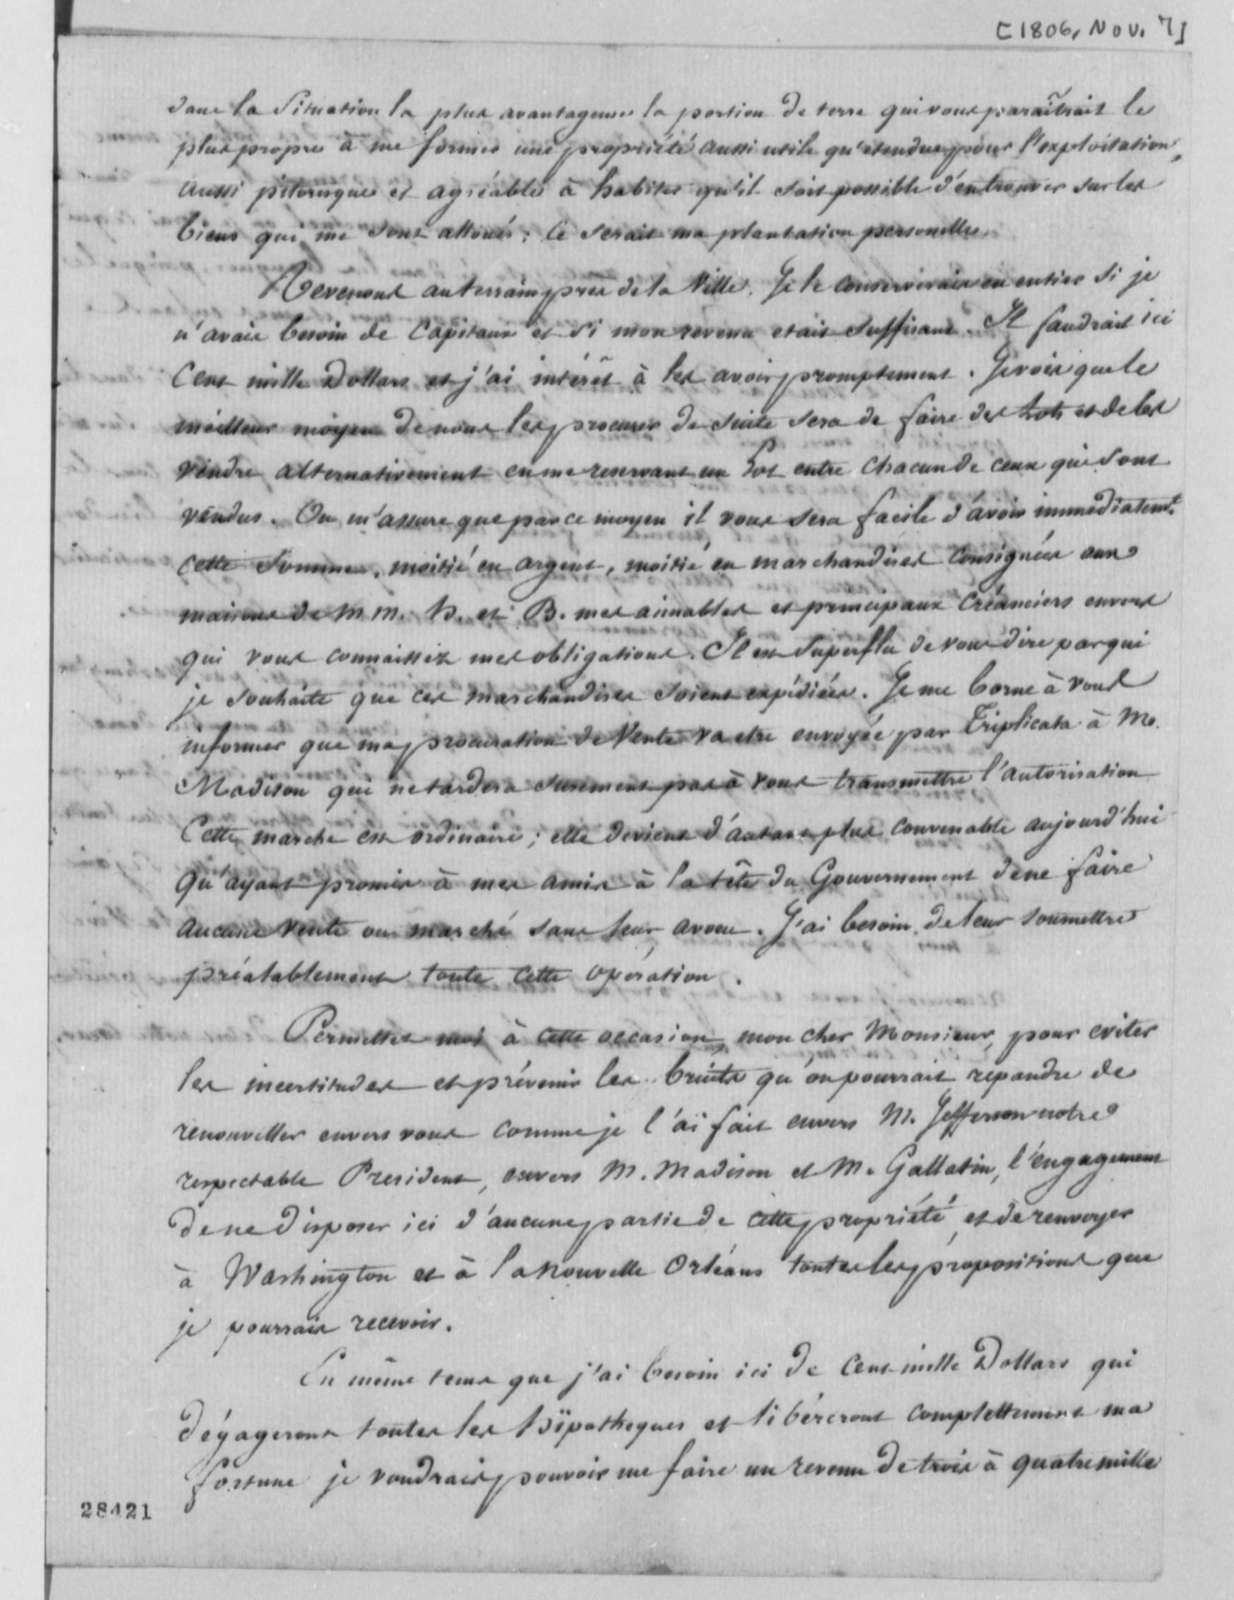 Marie Joseph Paul Yves Roch Gilbert du Motier, Marquis de Lafayette to Duplantier, November 7, 1806, in French, with Copy